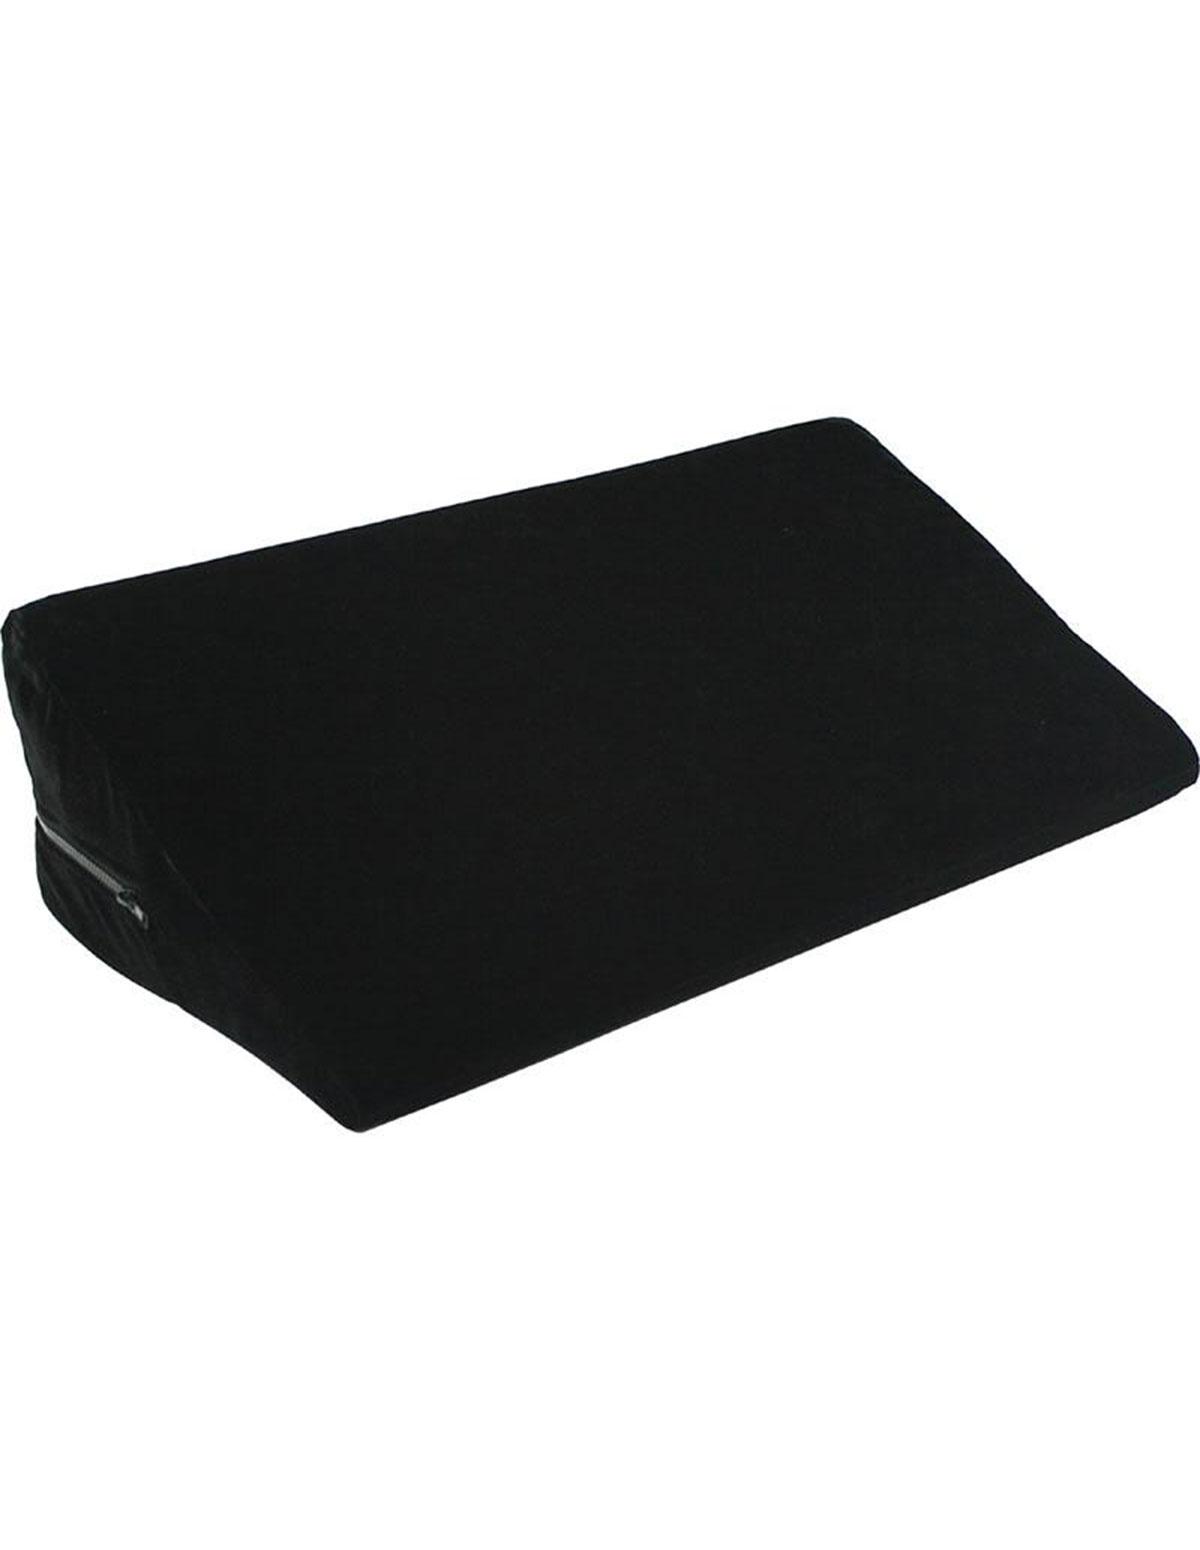 Mini Try-Angle Cushion